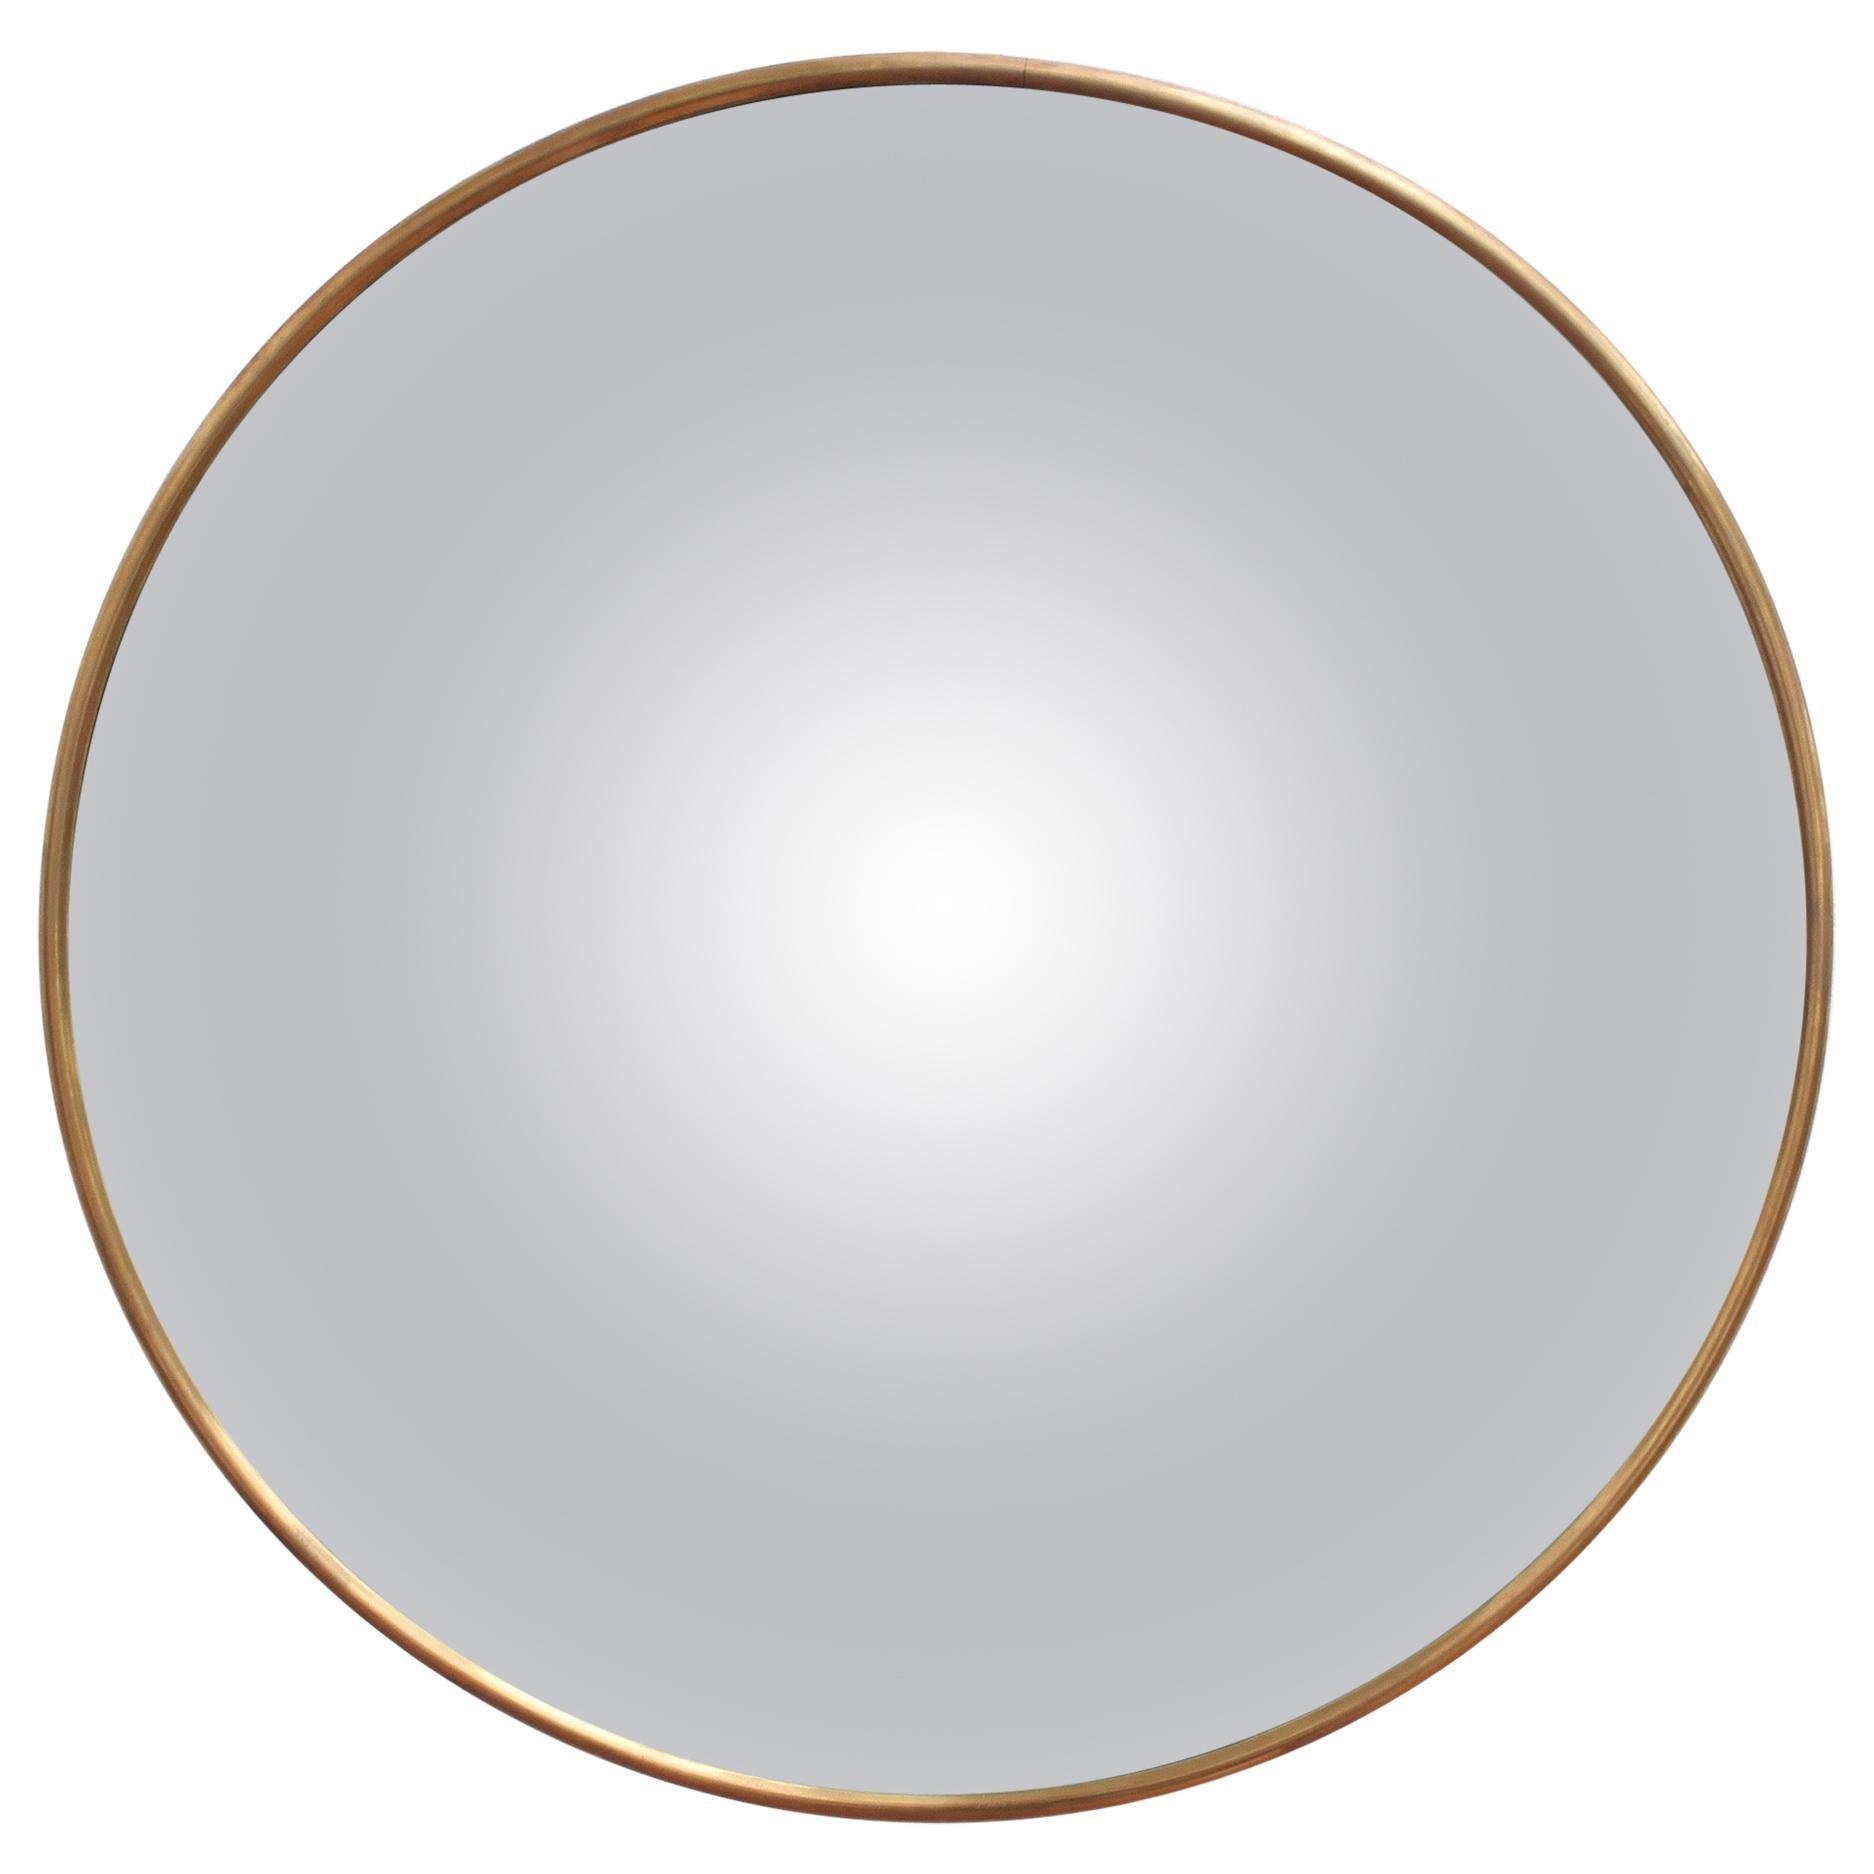 Midcentury Italian Convex Wall Mirror with Brass Frame 'circa 1950s'